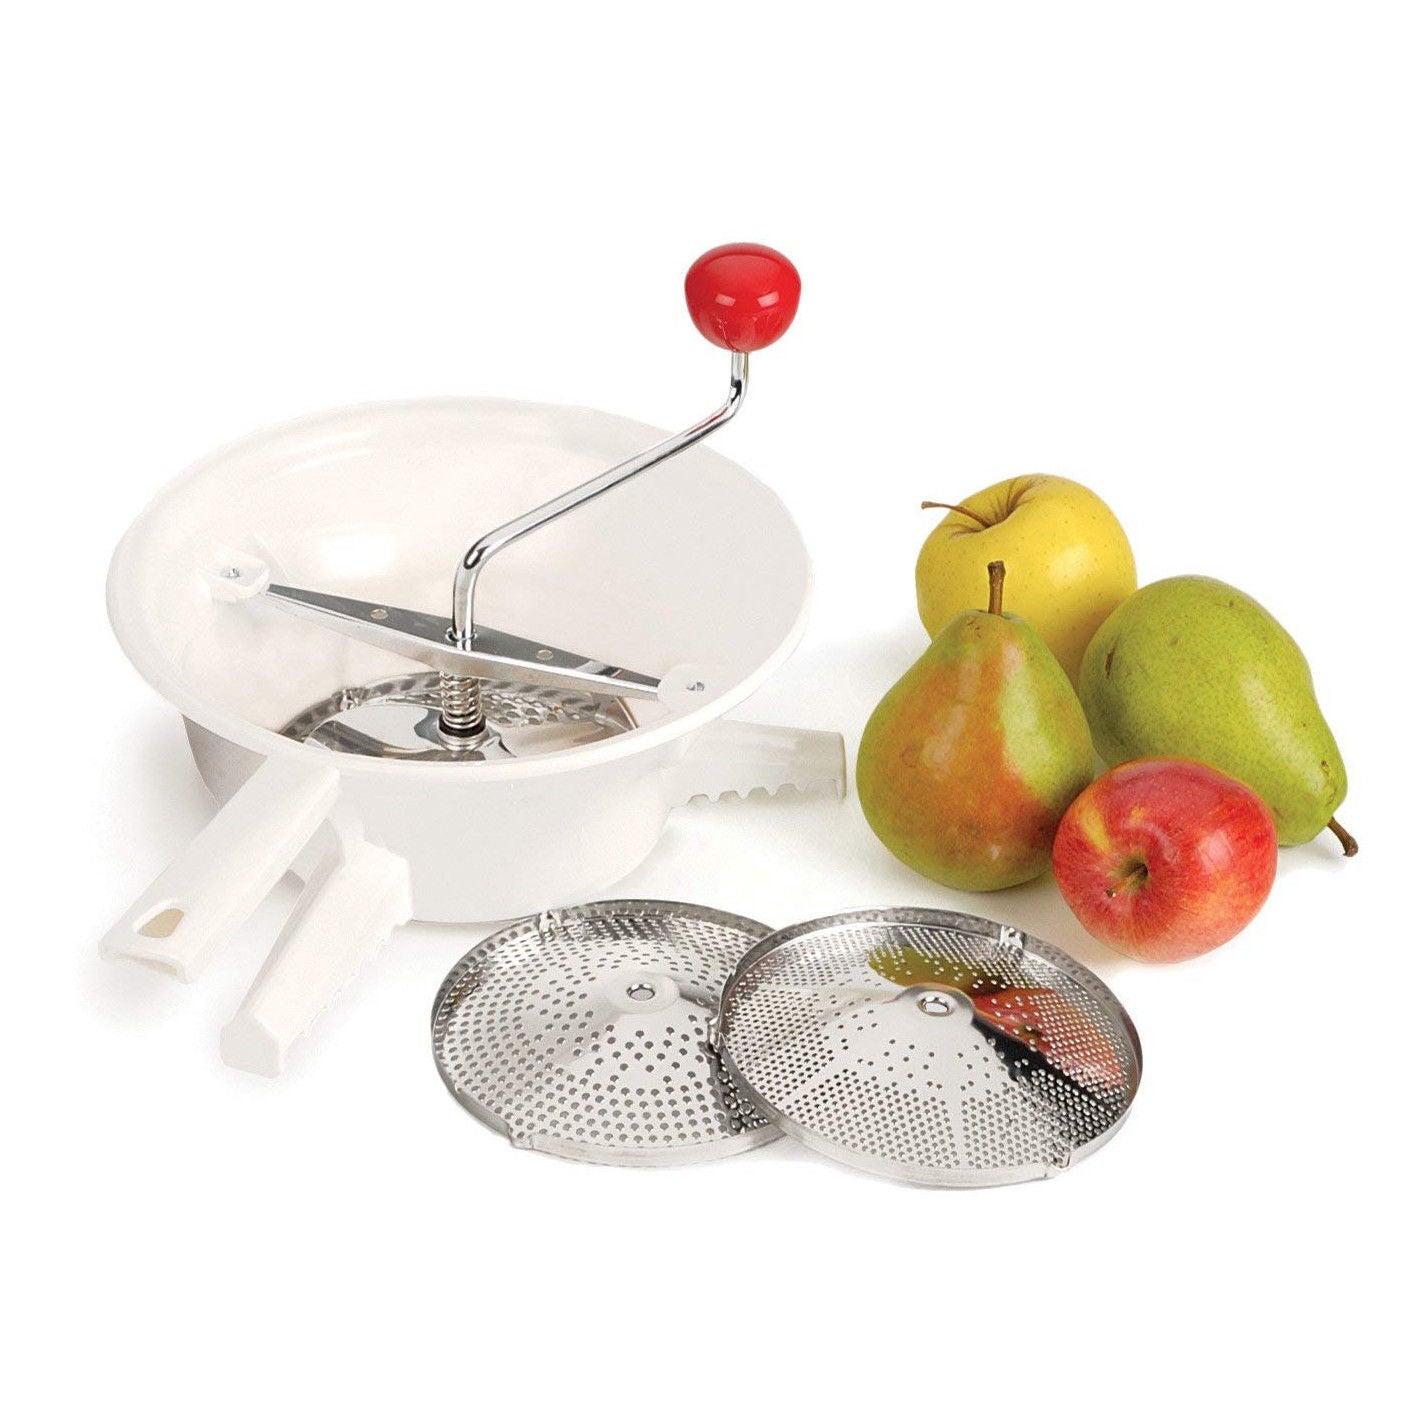 AVANTI Rotary Food Mill + 3 Discs Mouli Ricer Vegetable Food Chopper BPA FREE